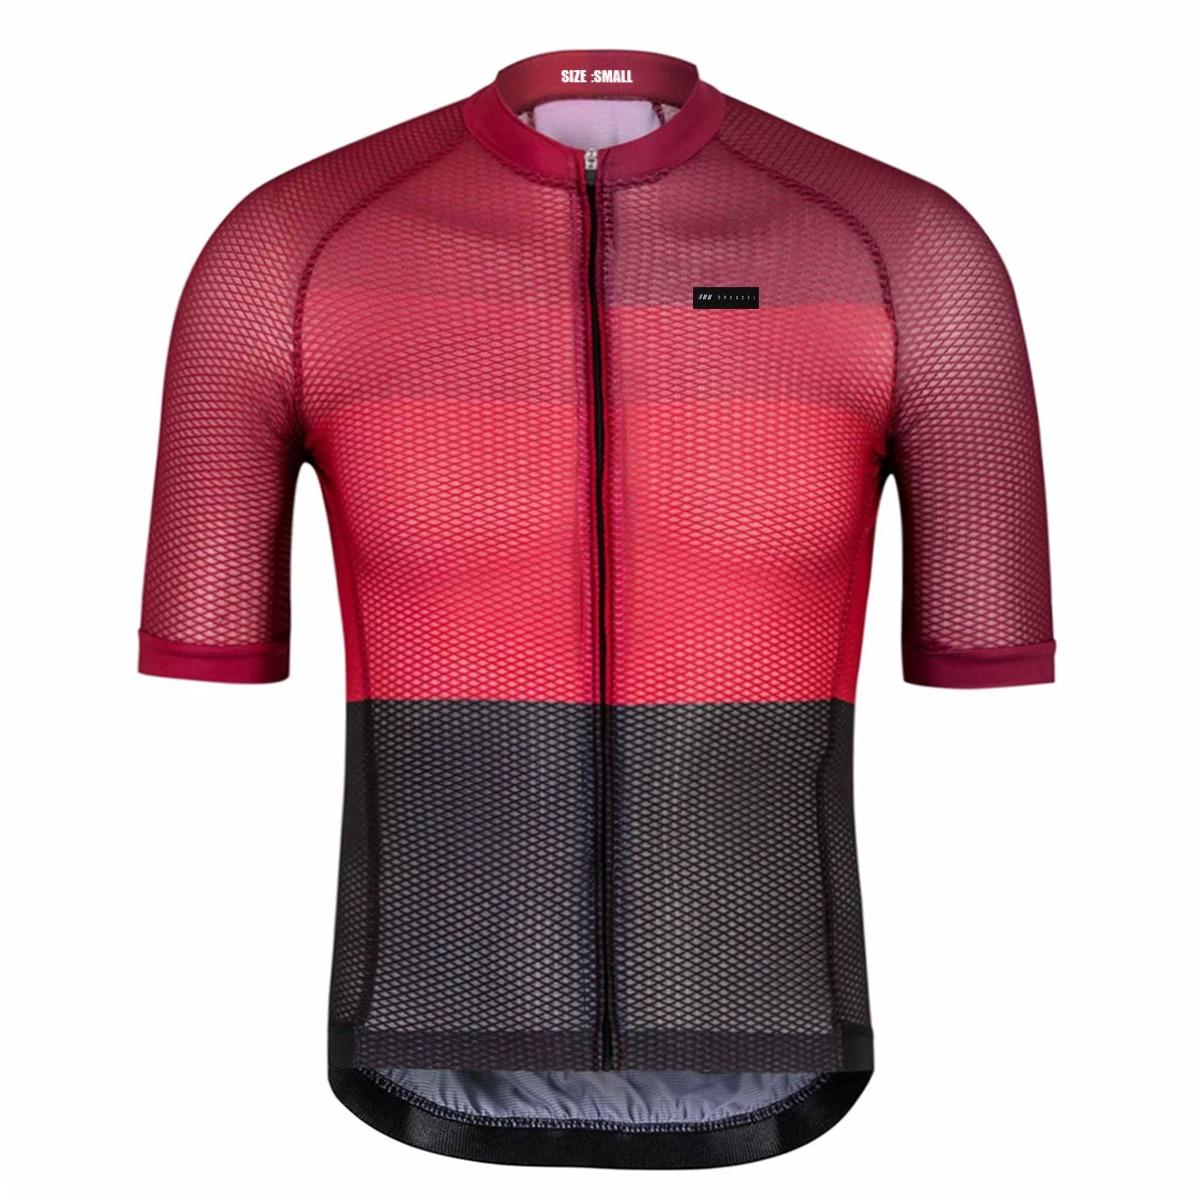 SPEXCEL-Camiseta de manga corta de ciclismo, ropa para bicicleta de montaña o...